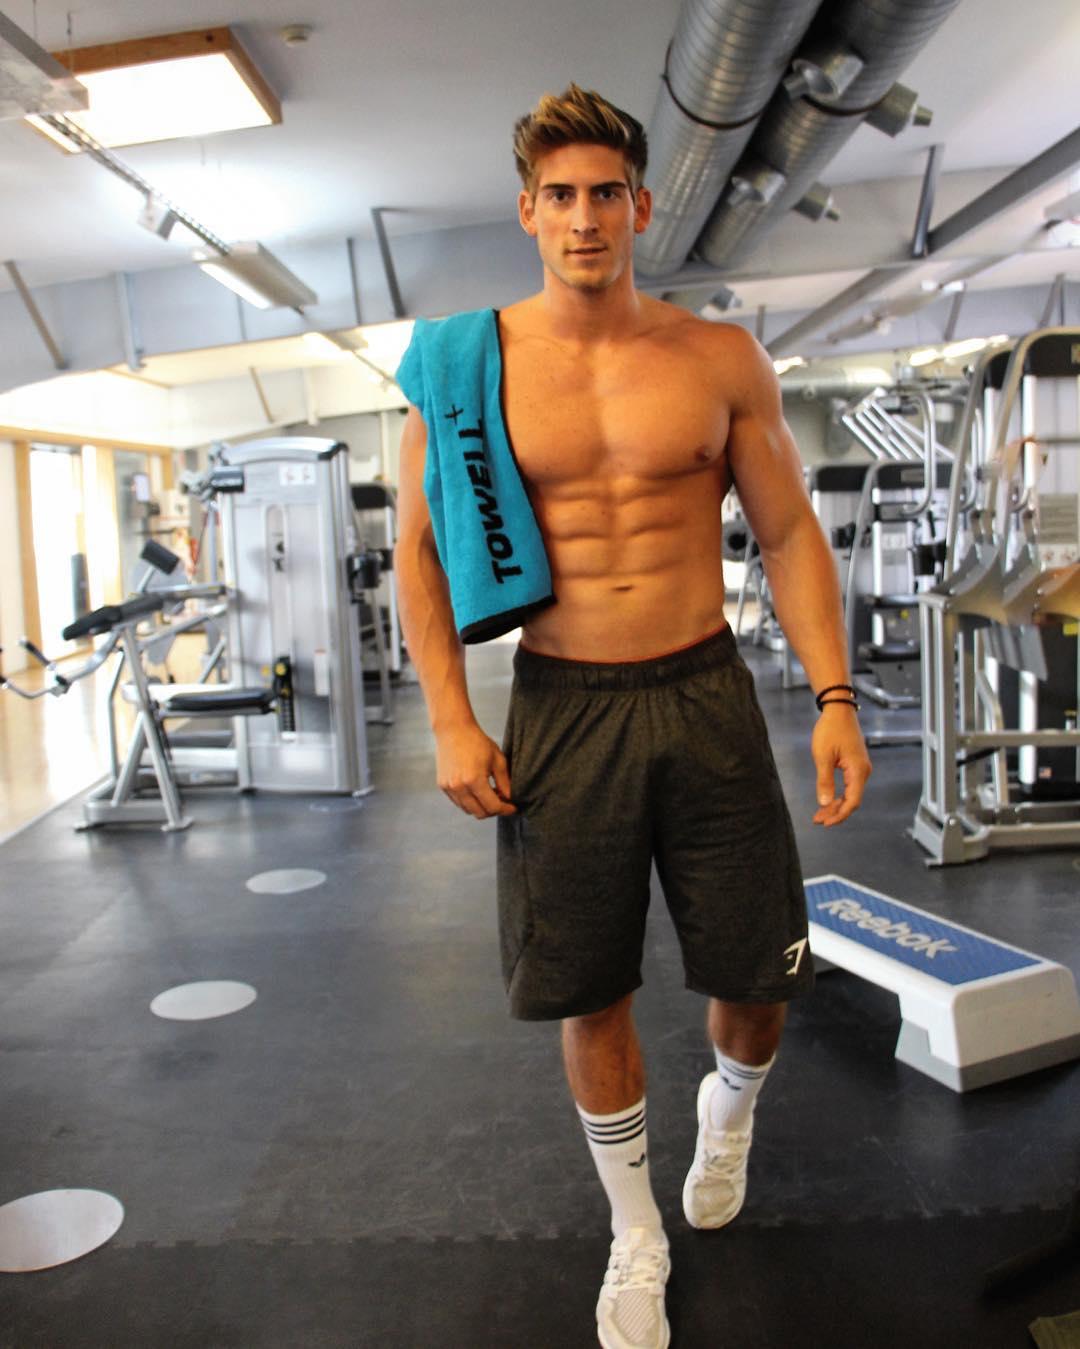 shirtless-tall-gym-hunk-sixpack-abs-socks-dude